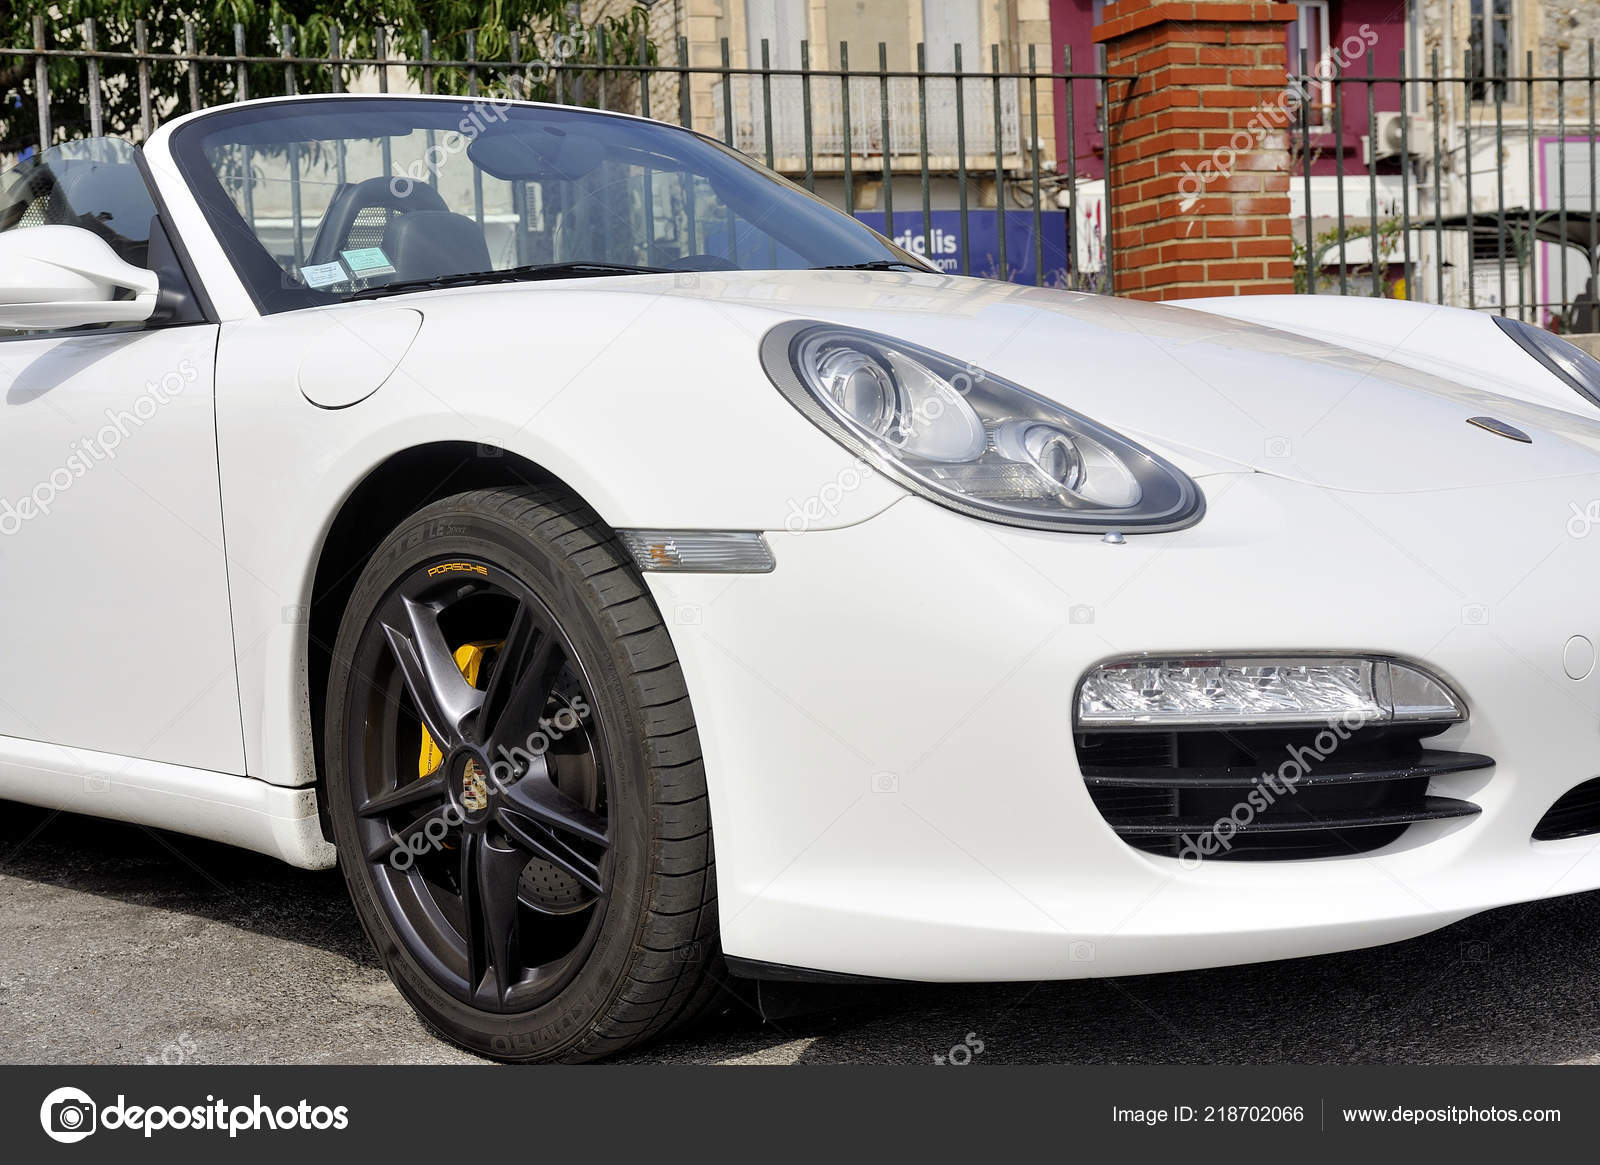 Ales France September 2018 Porsche Convertible White Sports Car Parking Stock Editorial Photo C Gilles Paire 218702066